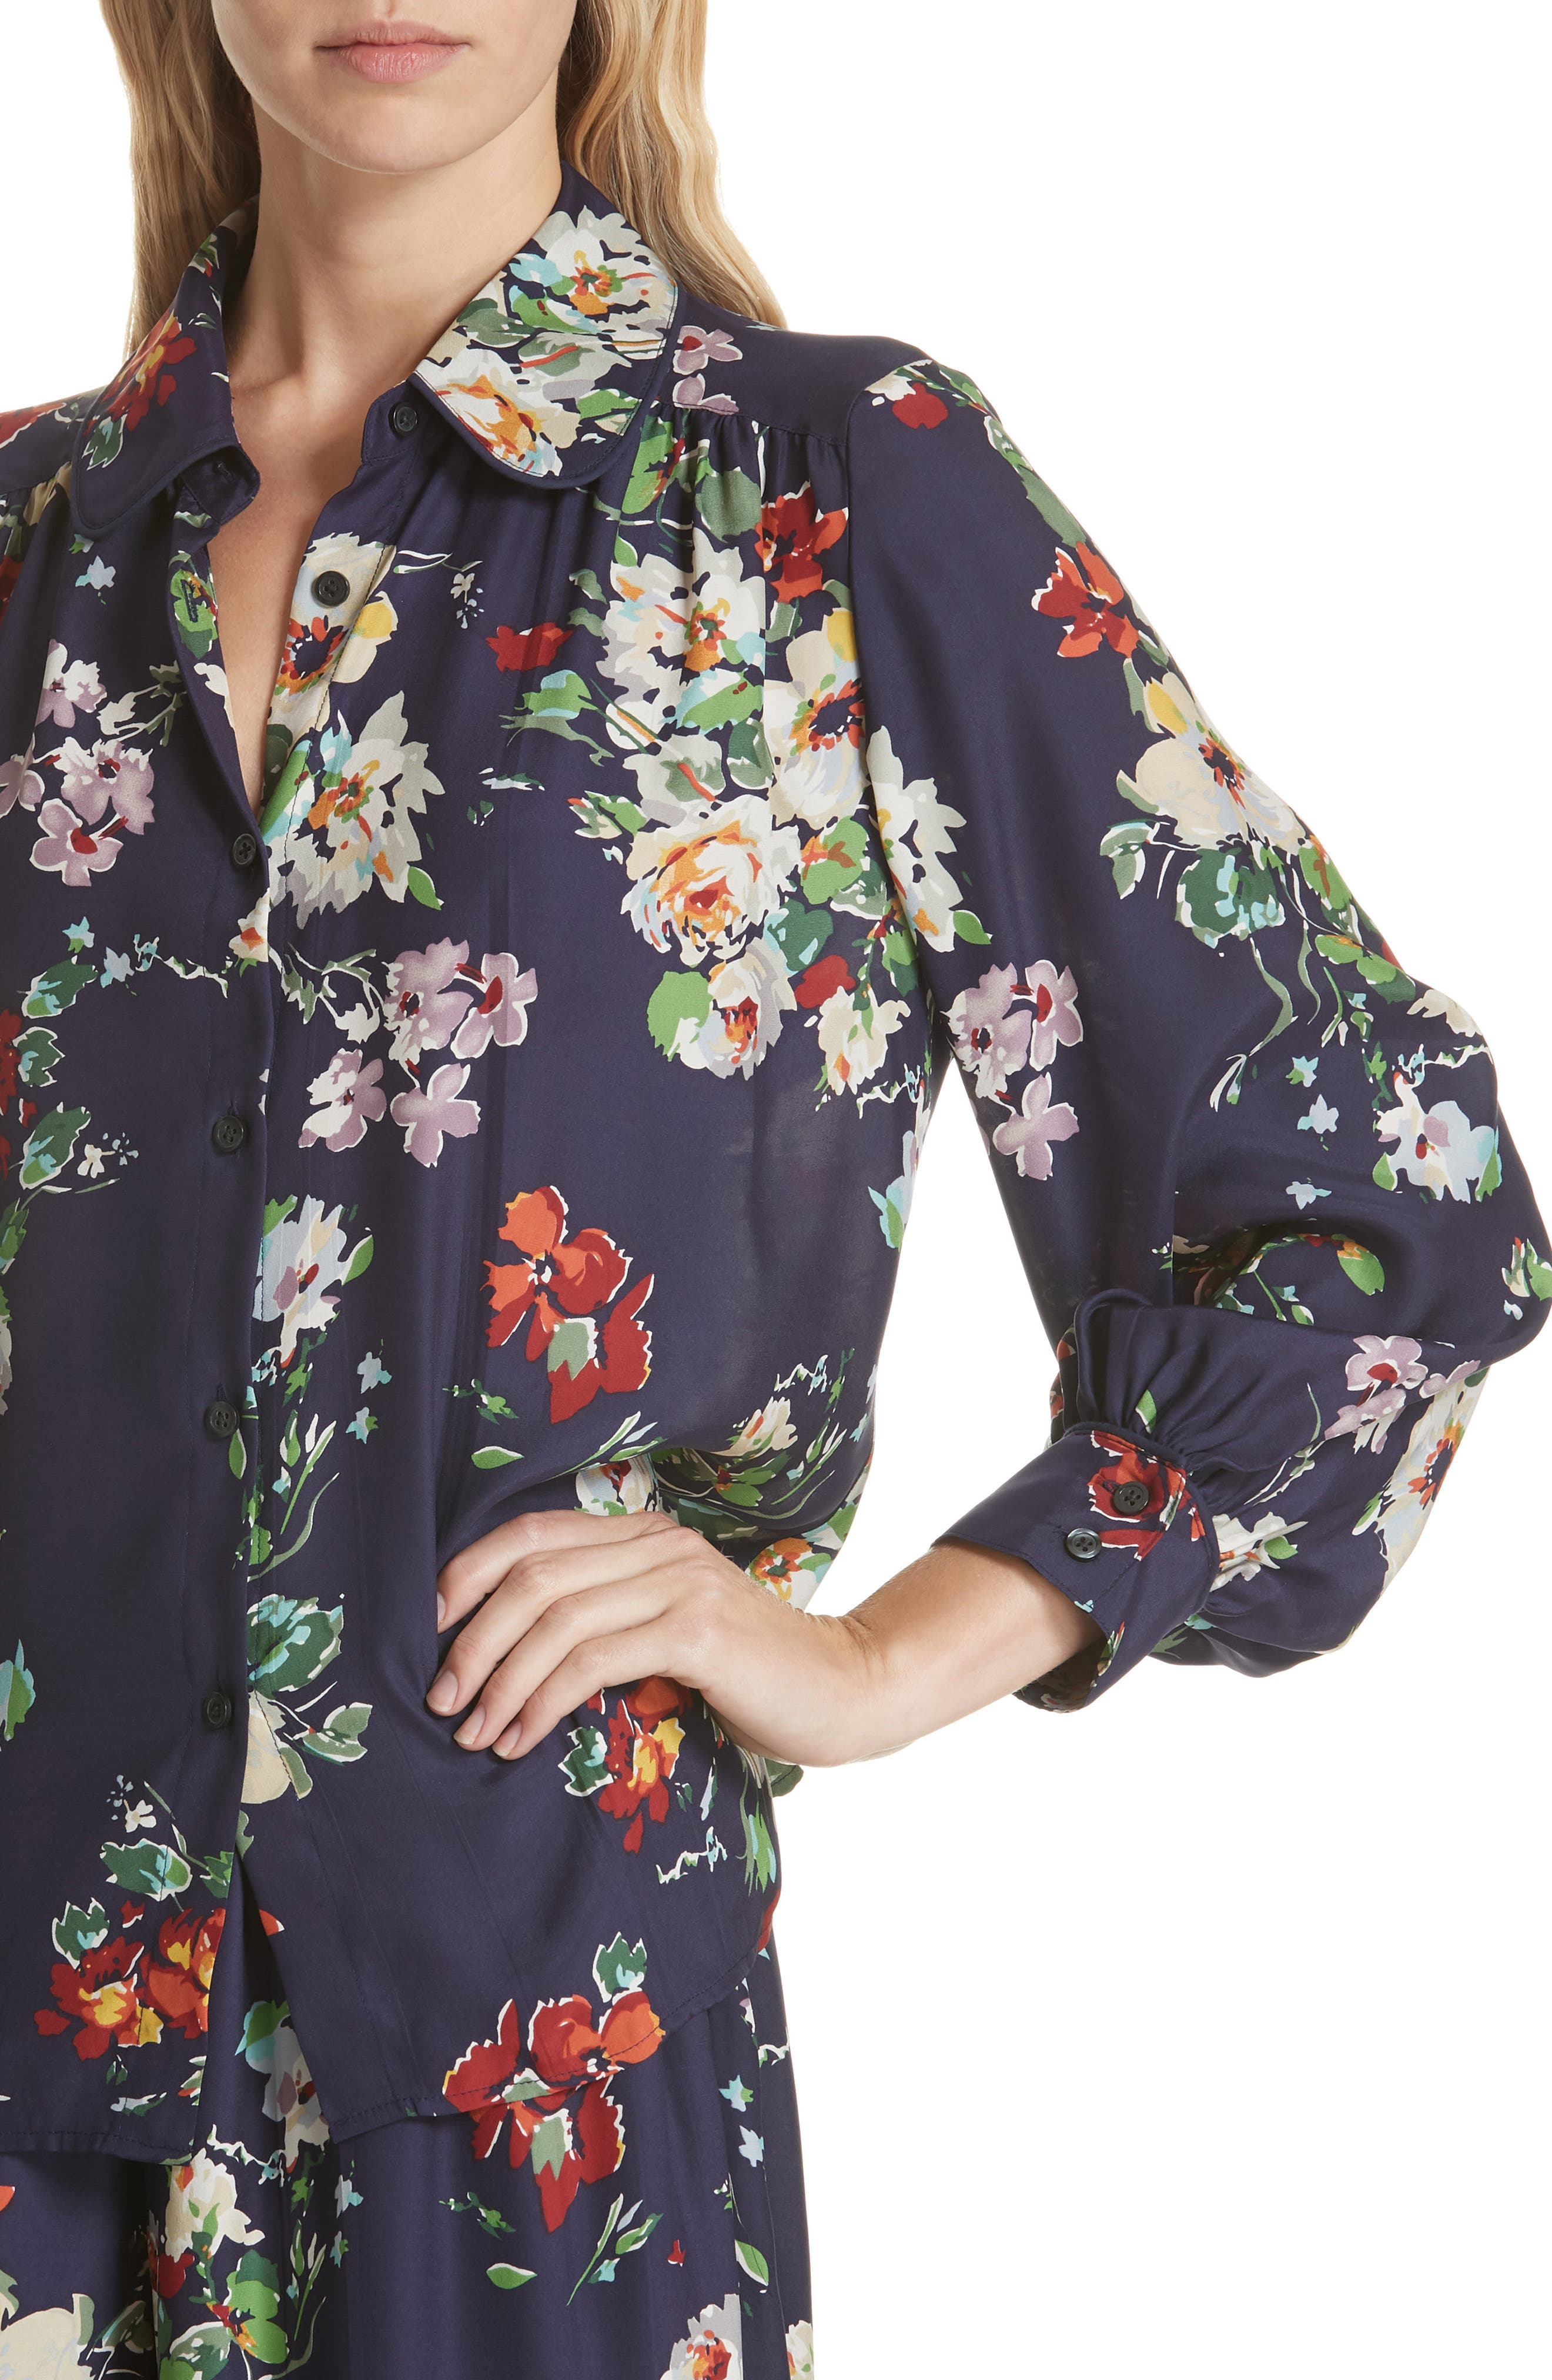 Floral Silk Blouse,                             Alternate thumbnail 4, color,                             NIGHTFALL FLORAL PRINT